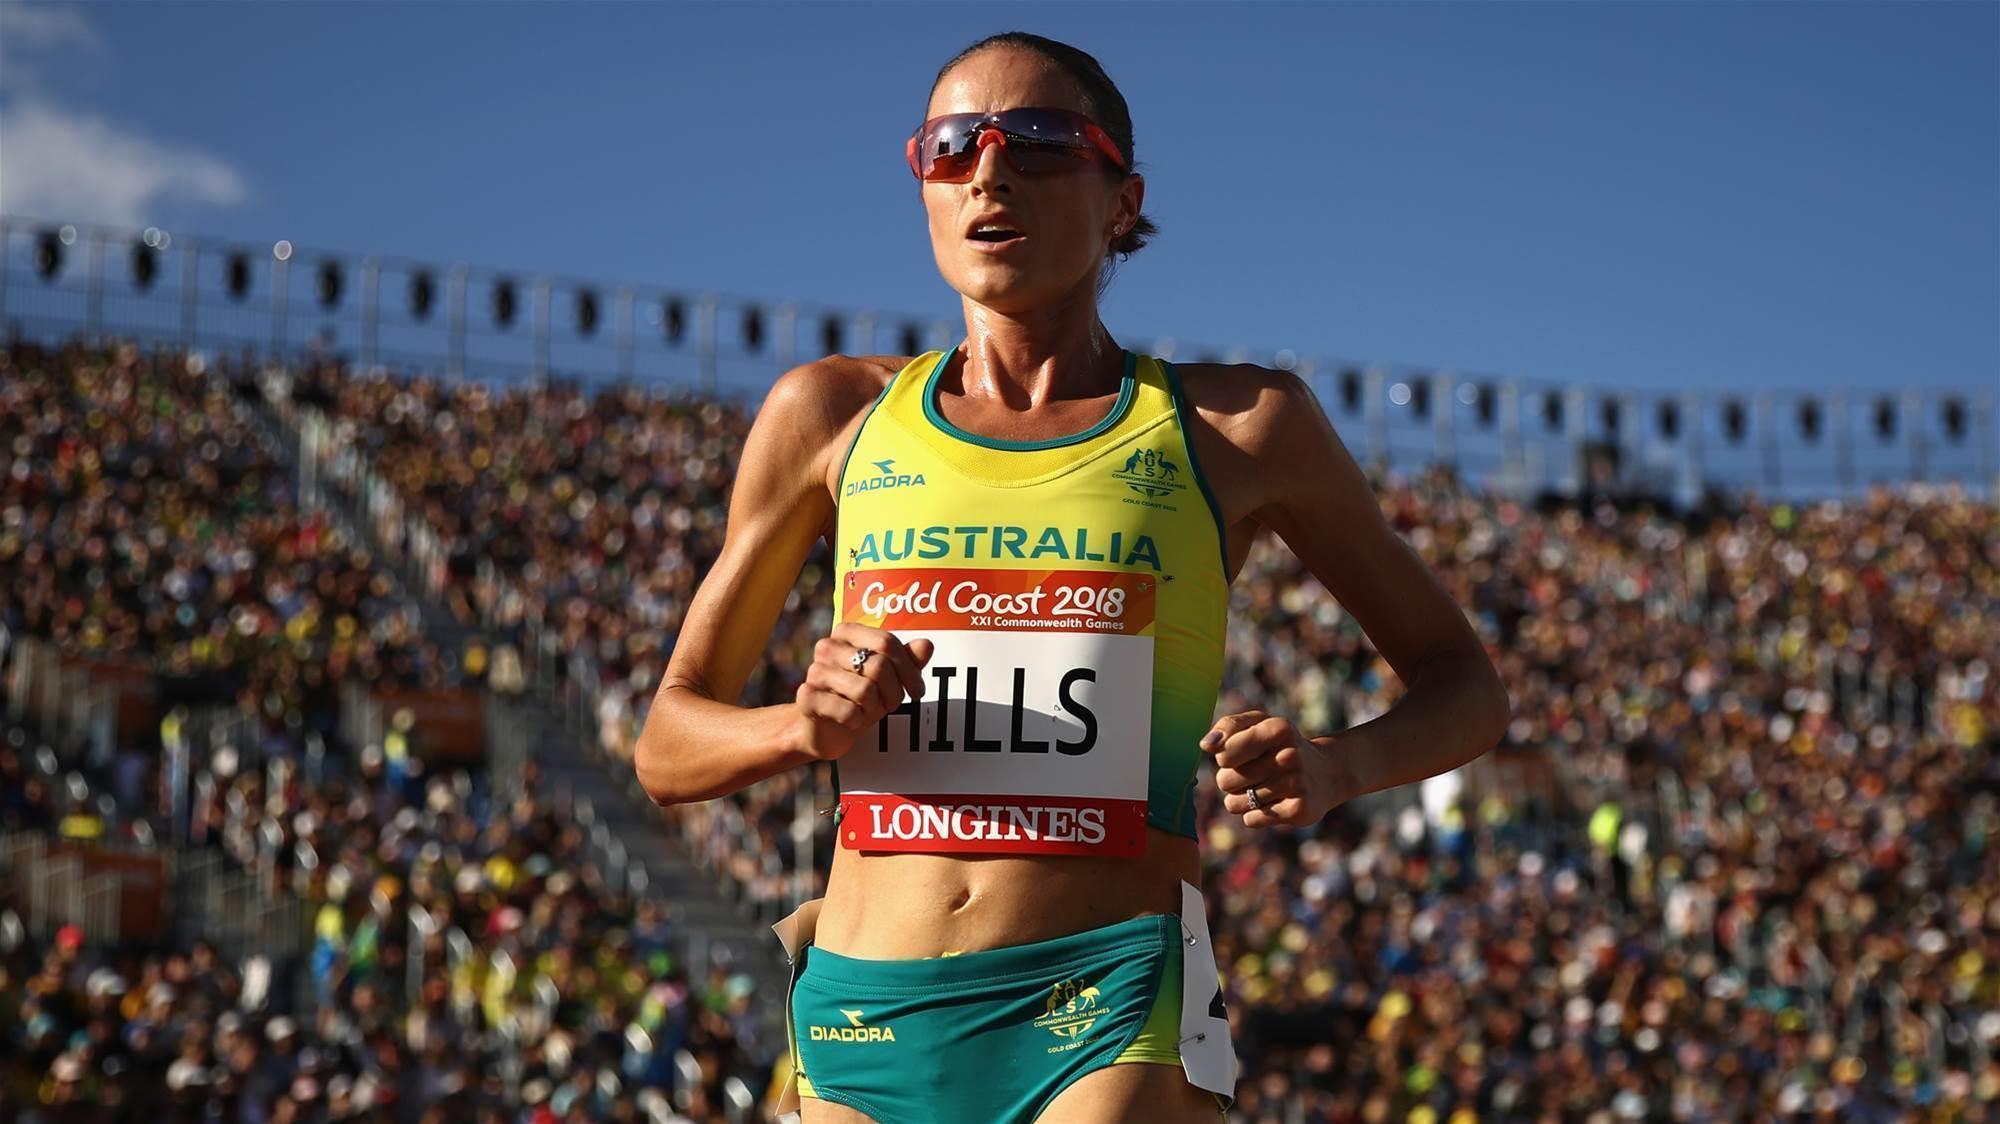 Hills takes out 10km run at Gold Coast Marathon